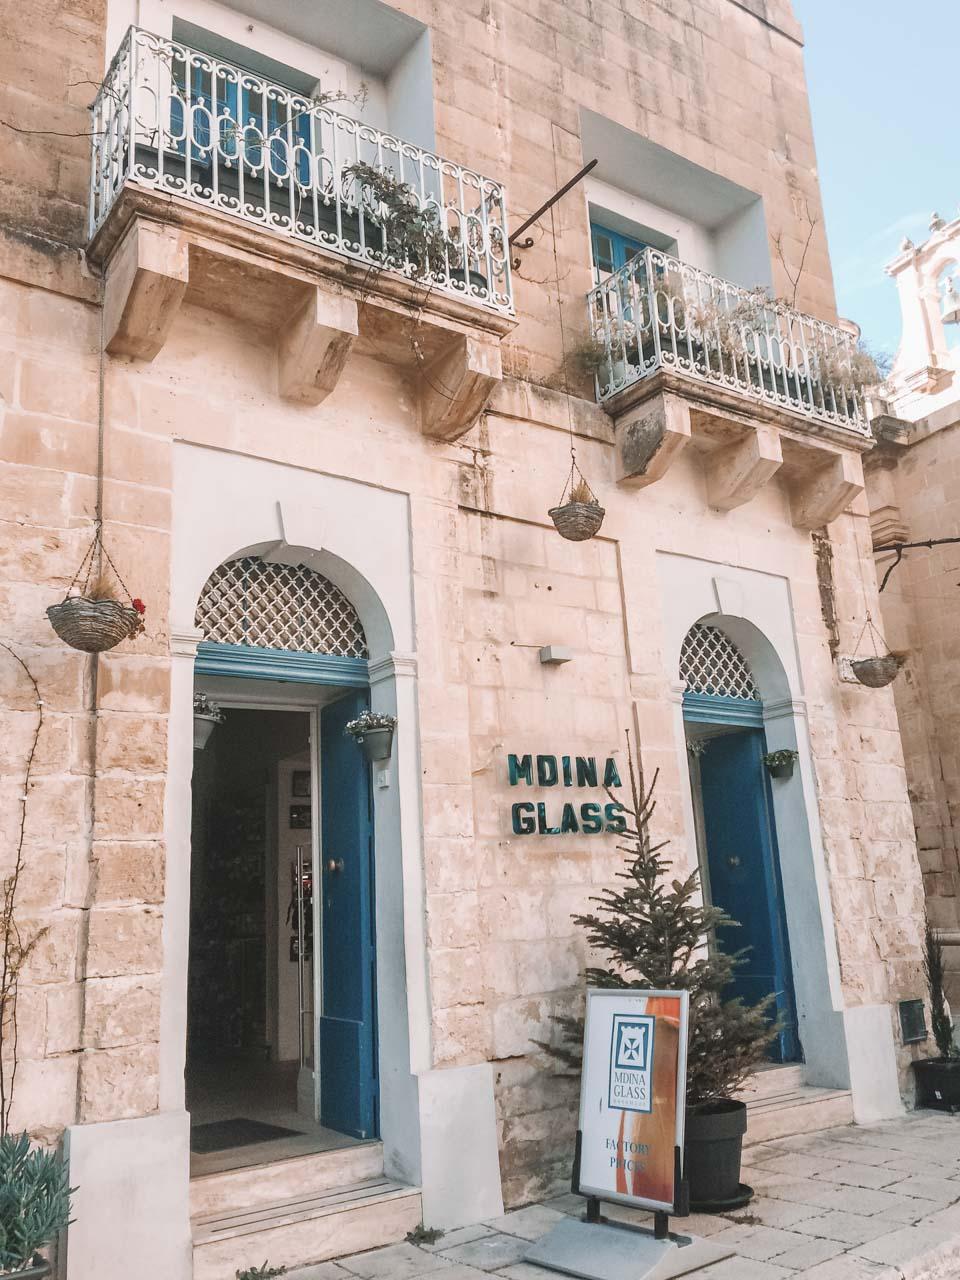 A traditional souvenir shop selling glassware made of Mdina Glass in Mdina, Malta